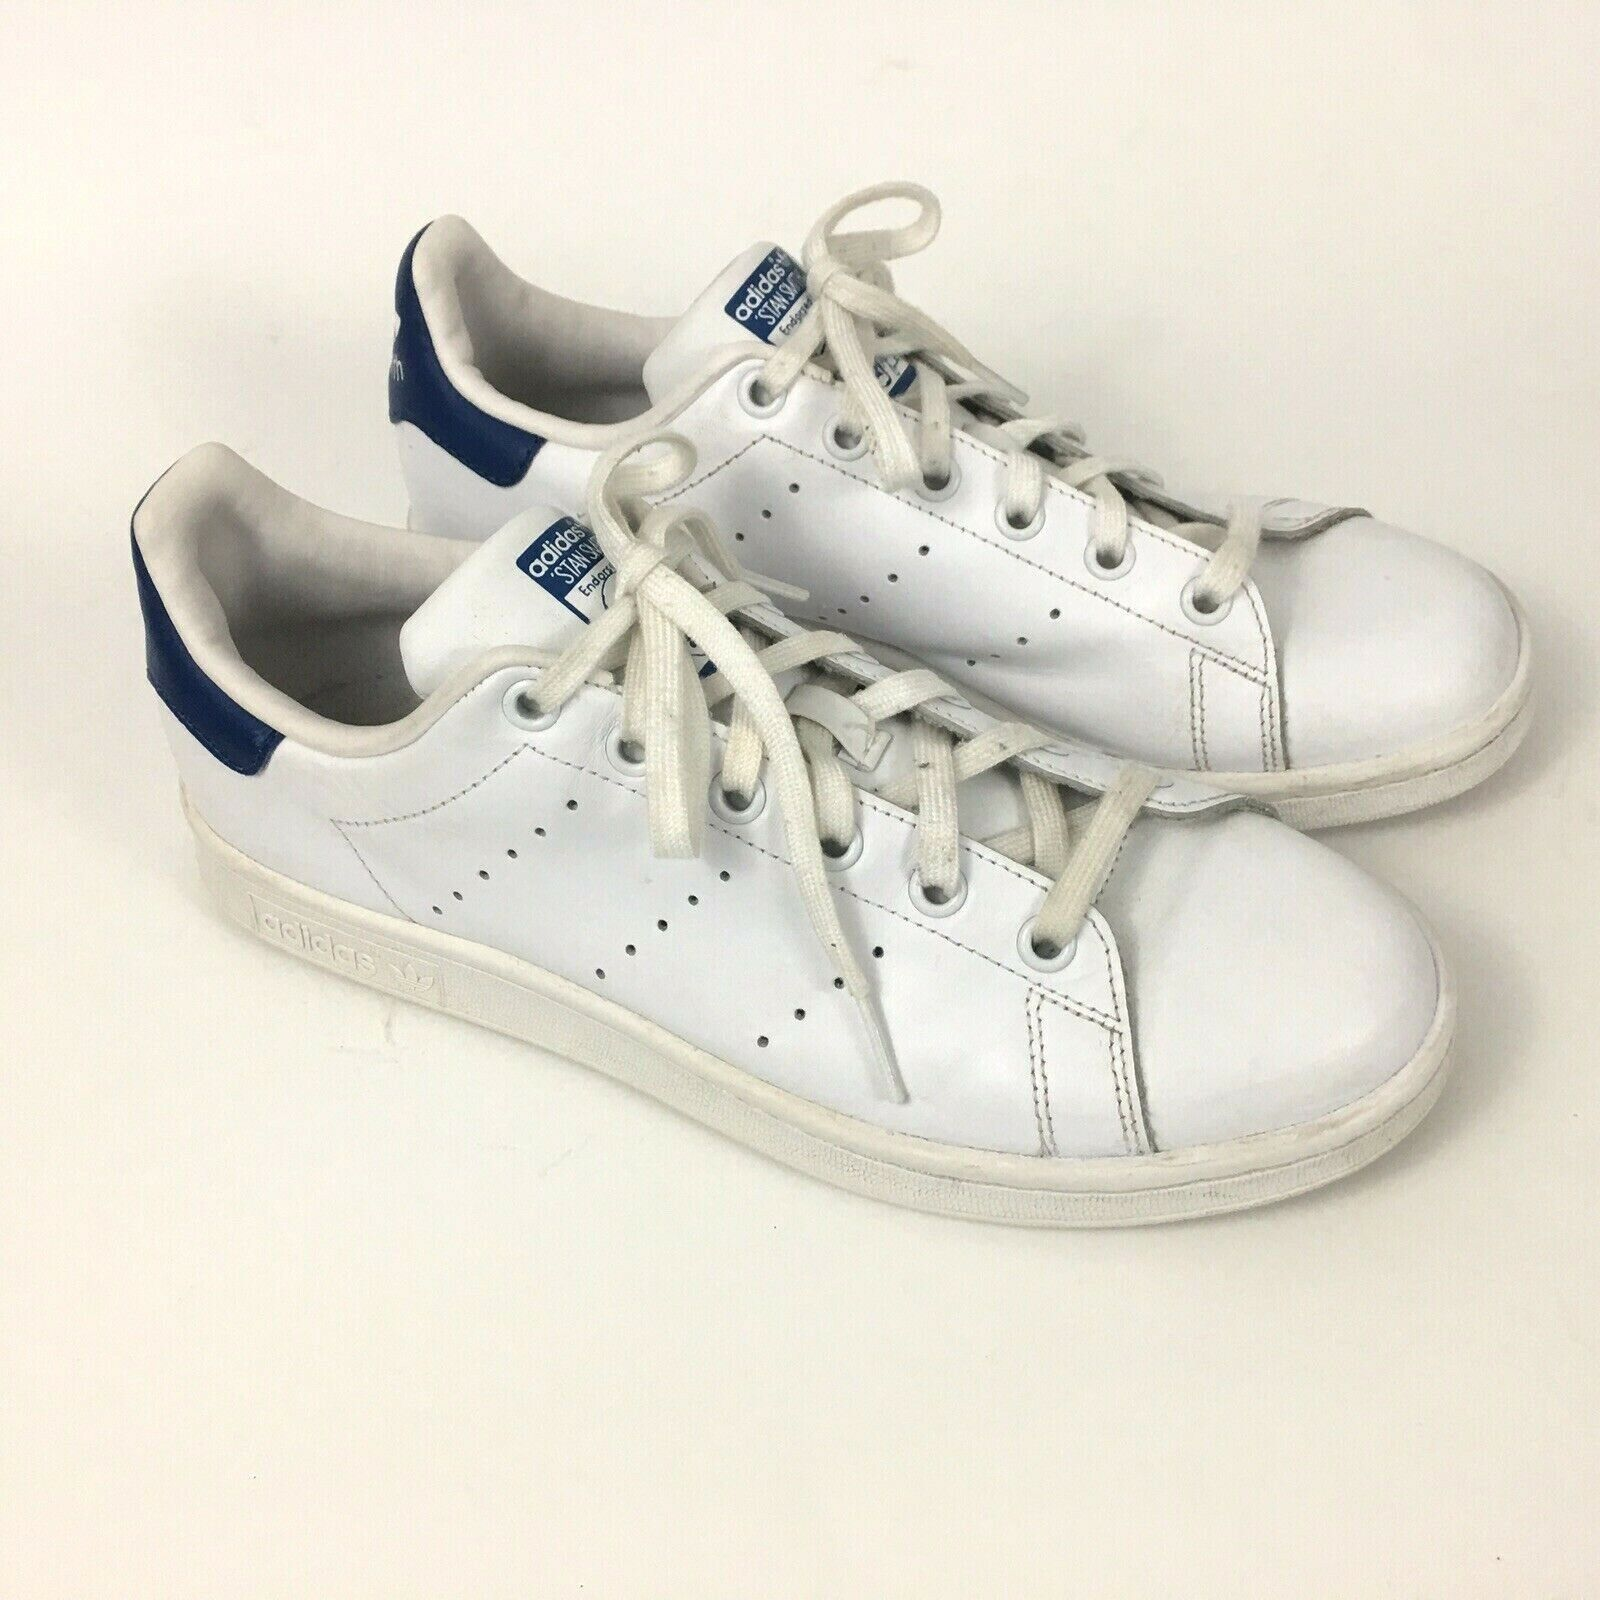 stan smith y adidas superstar